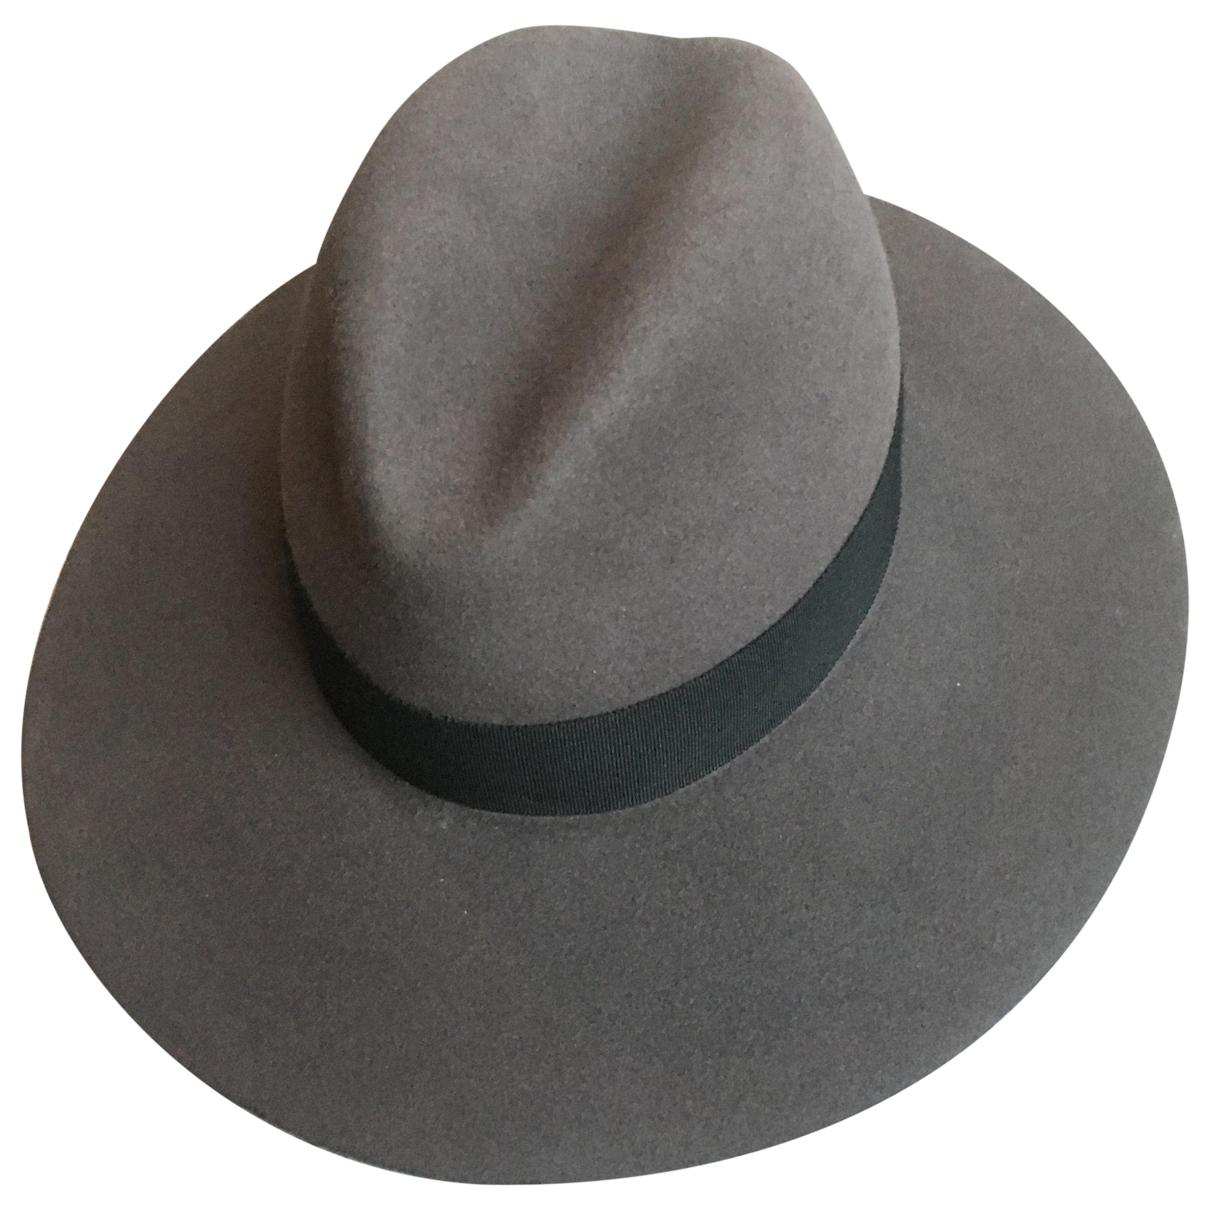 Sombrero de Conejo Saint Laurent